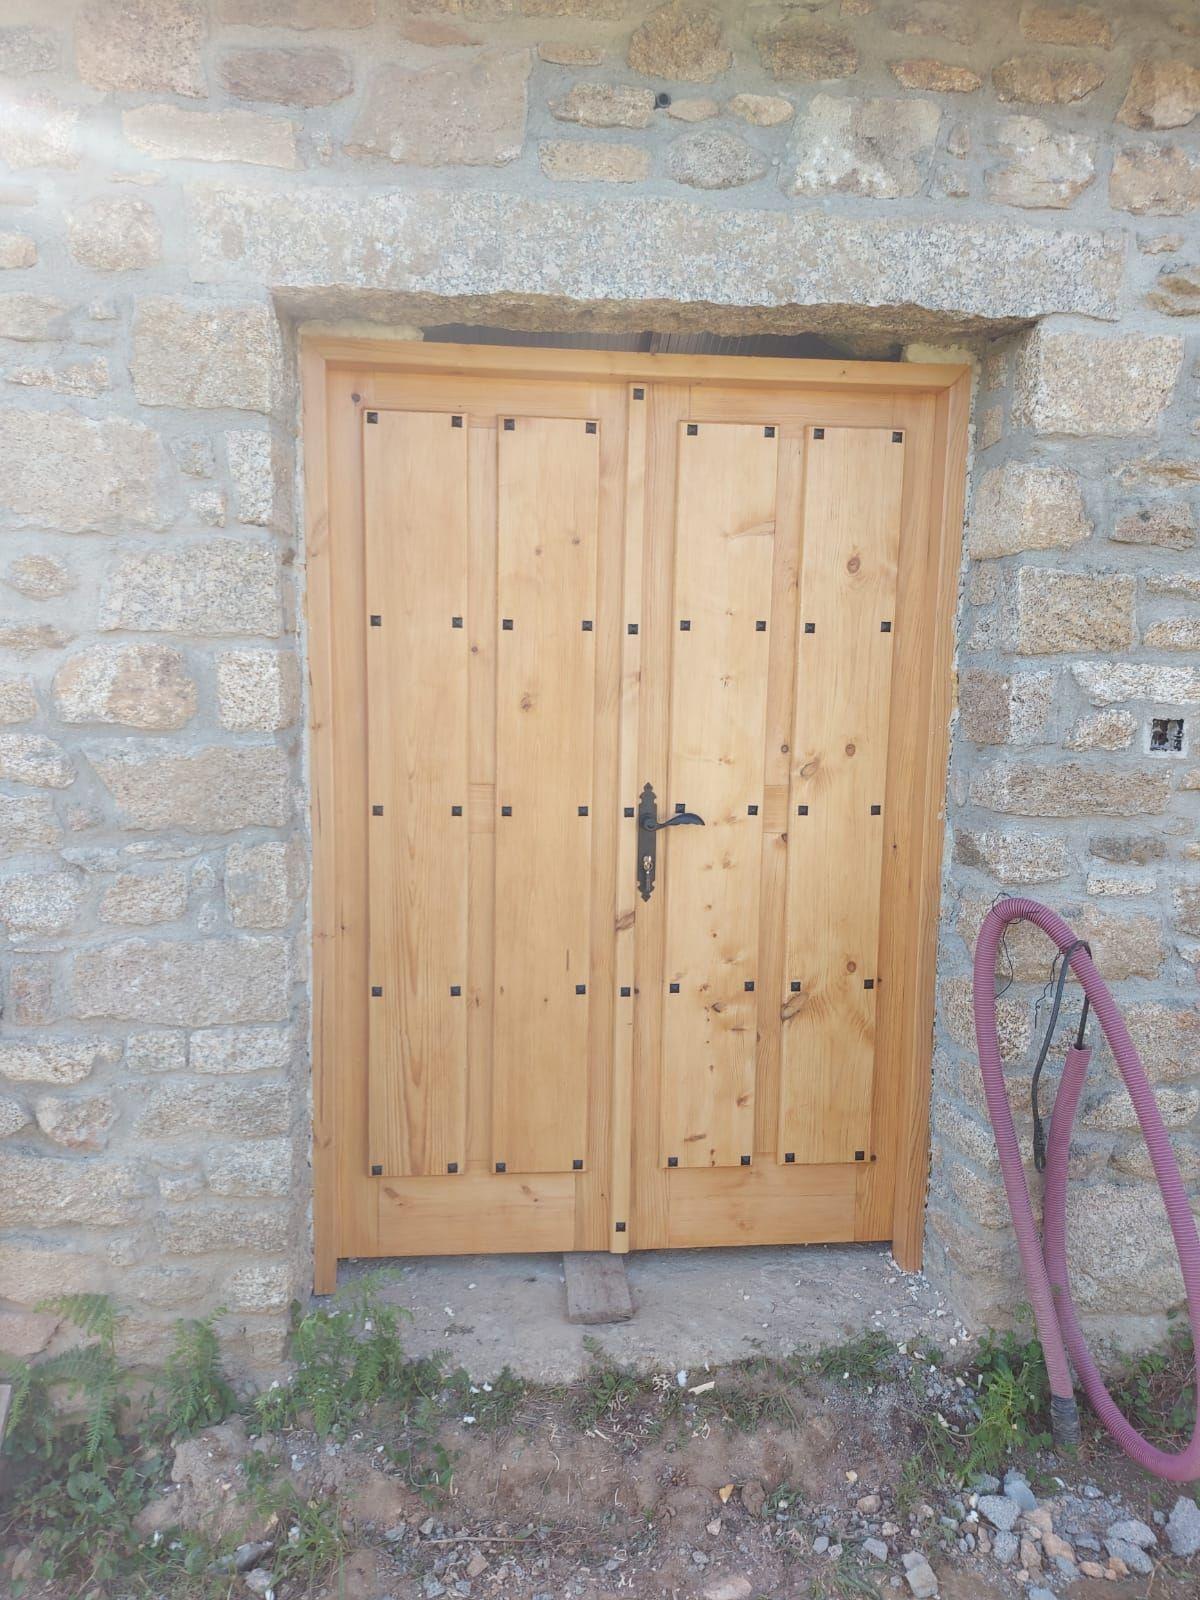 Puerta bodega hecha en madera pino en rustico Parte exterior